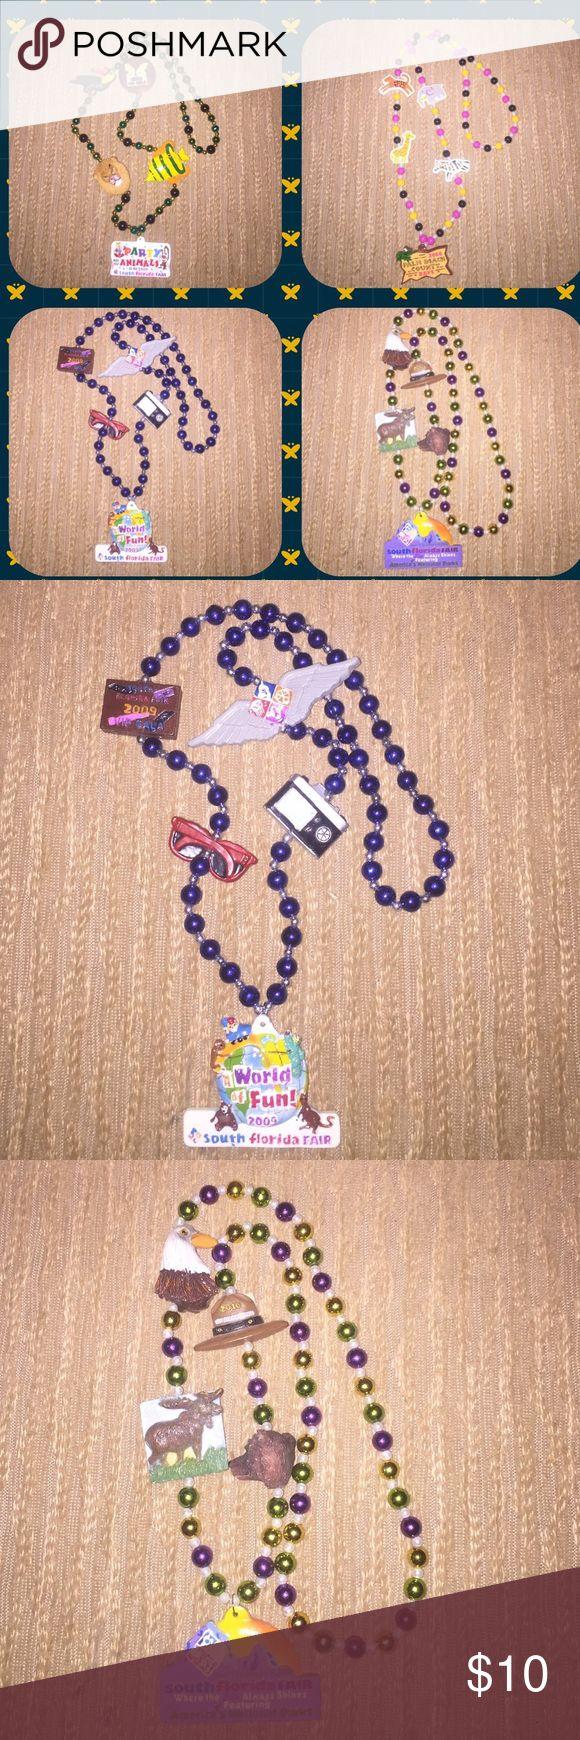 4 Unique South Florida Fair Mardi Gras Beads!!! 4 Unique South Florida Fair Mardi Gras Beads!!! Jewelry Necklaces